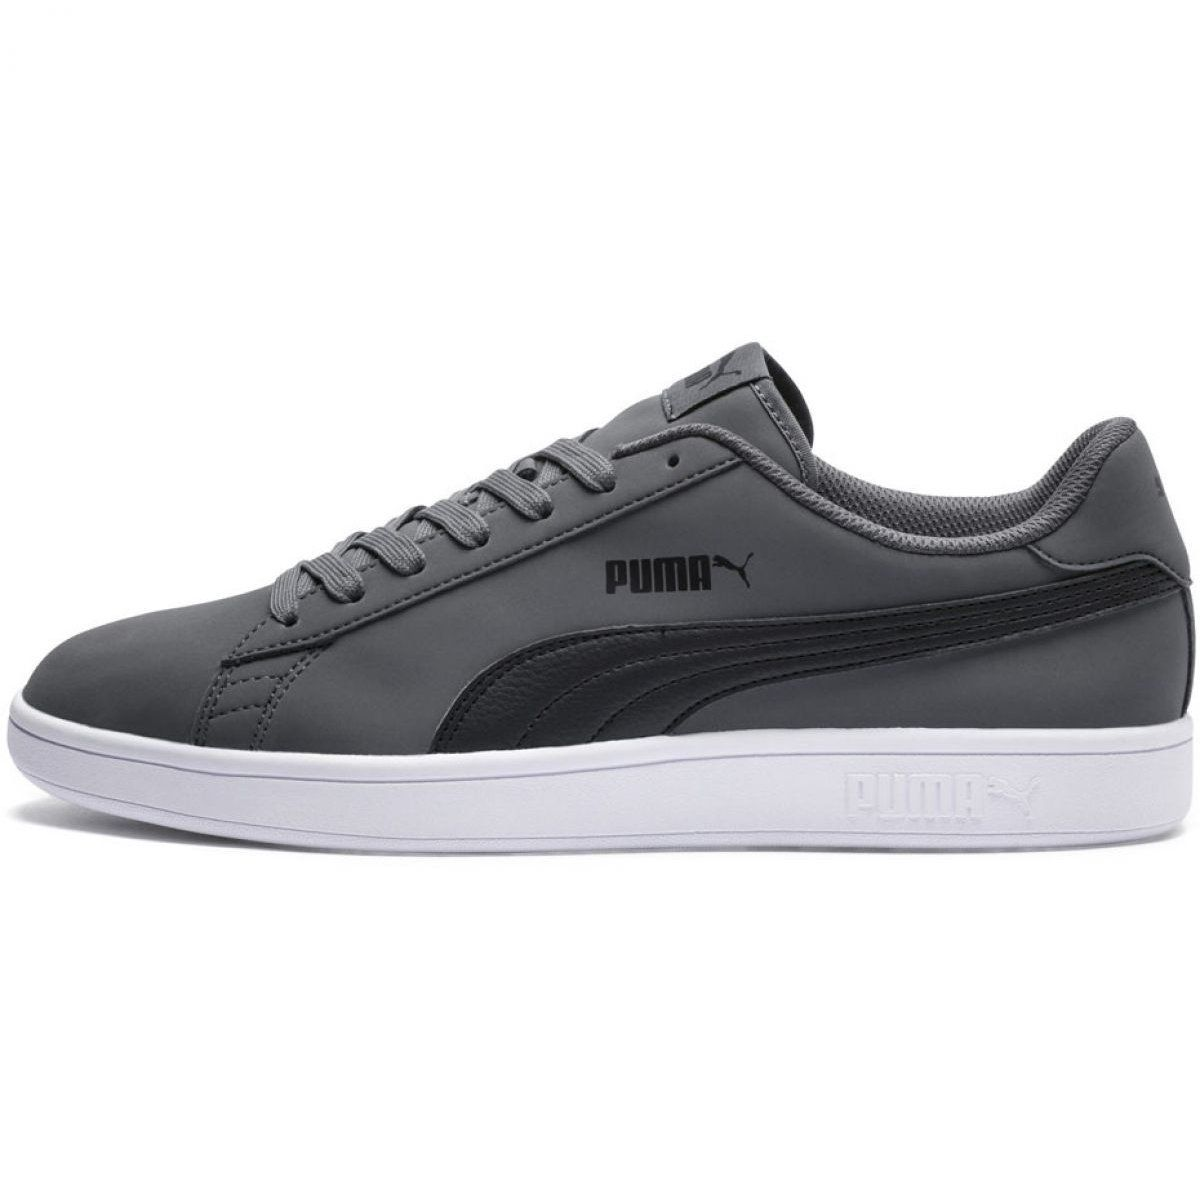 Buty Puma Smash V2 Buck M 365160 08 Szare Sport Shoes Men Puma Sports Shoes Puma